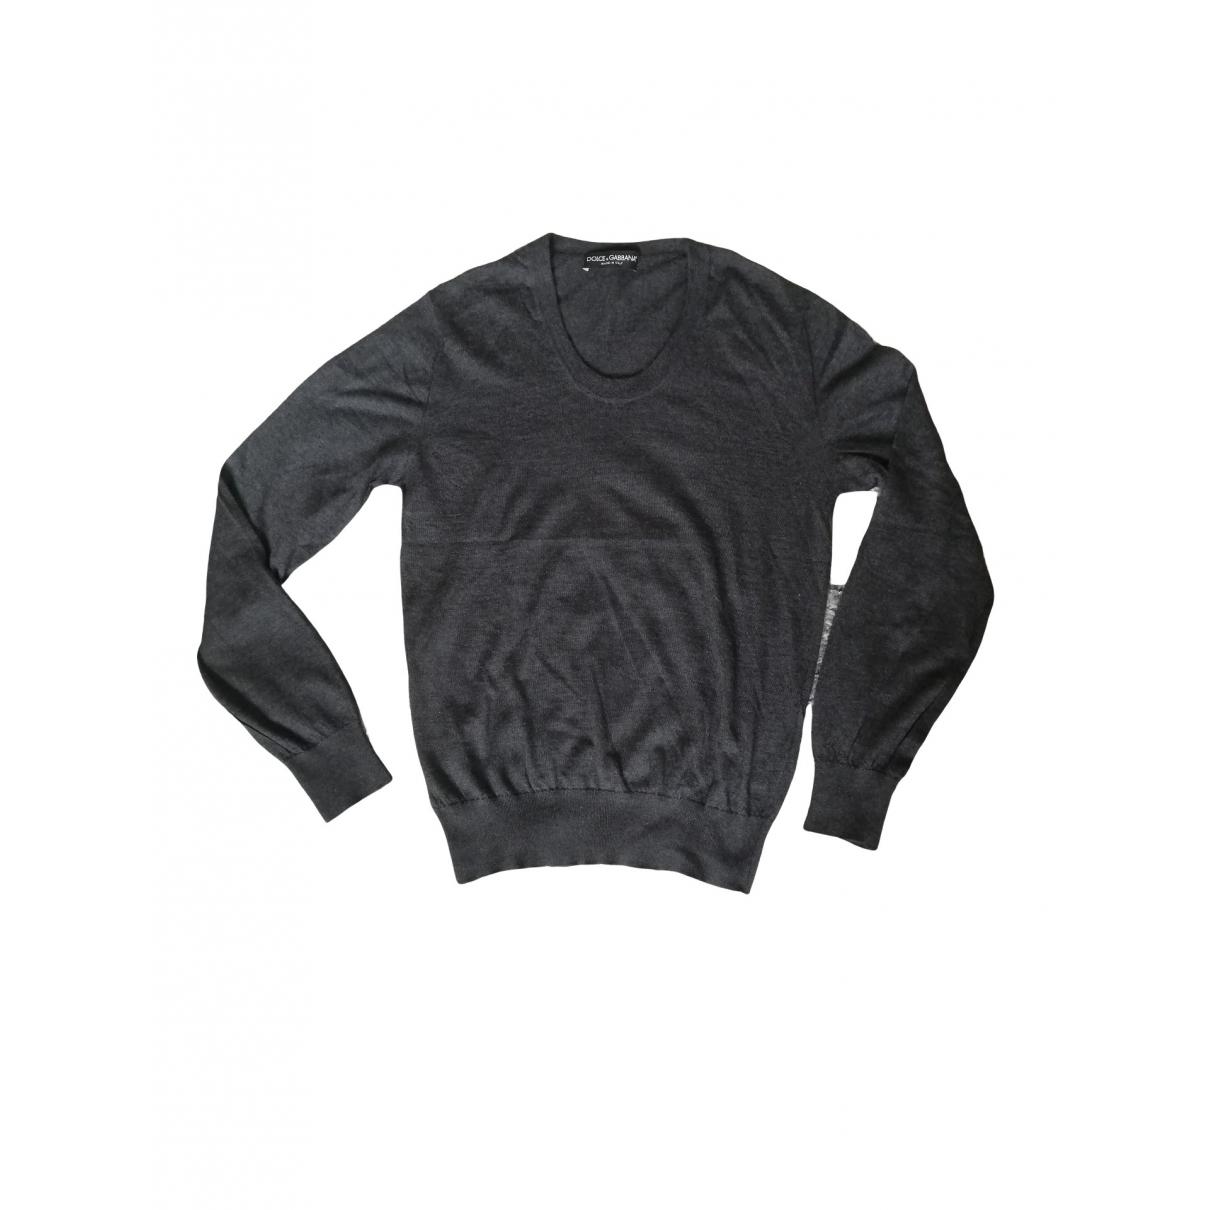 Dolce & Gabbana \N Anthracite Cashmere Knitwear & Sweatshirts for Men 50 IT